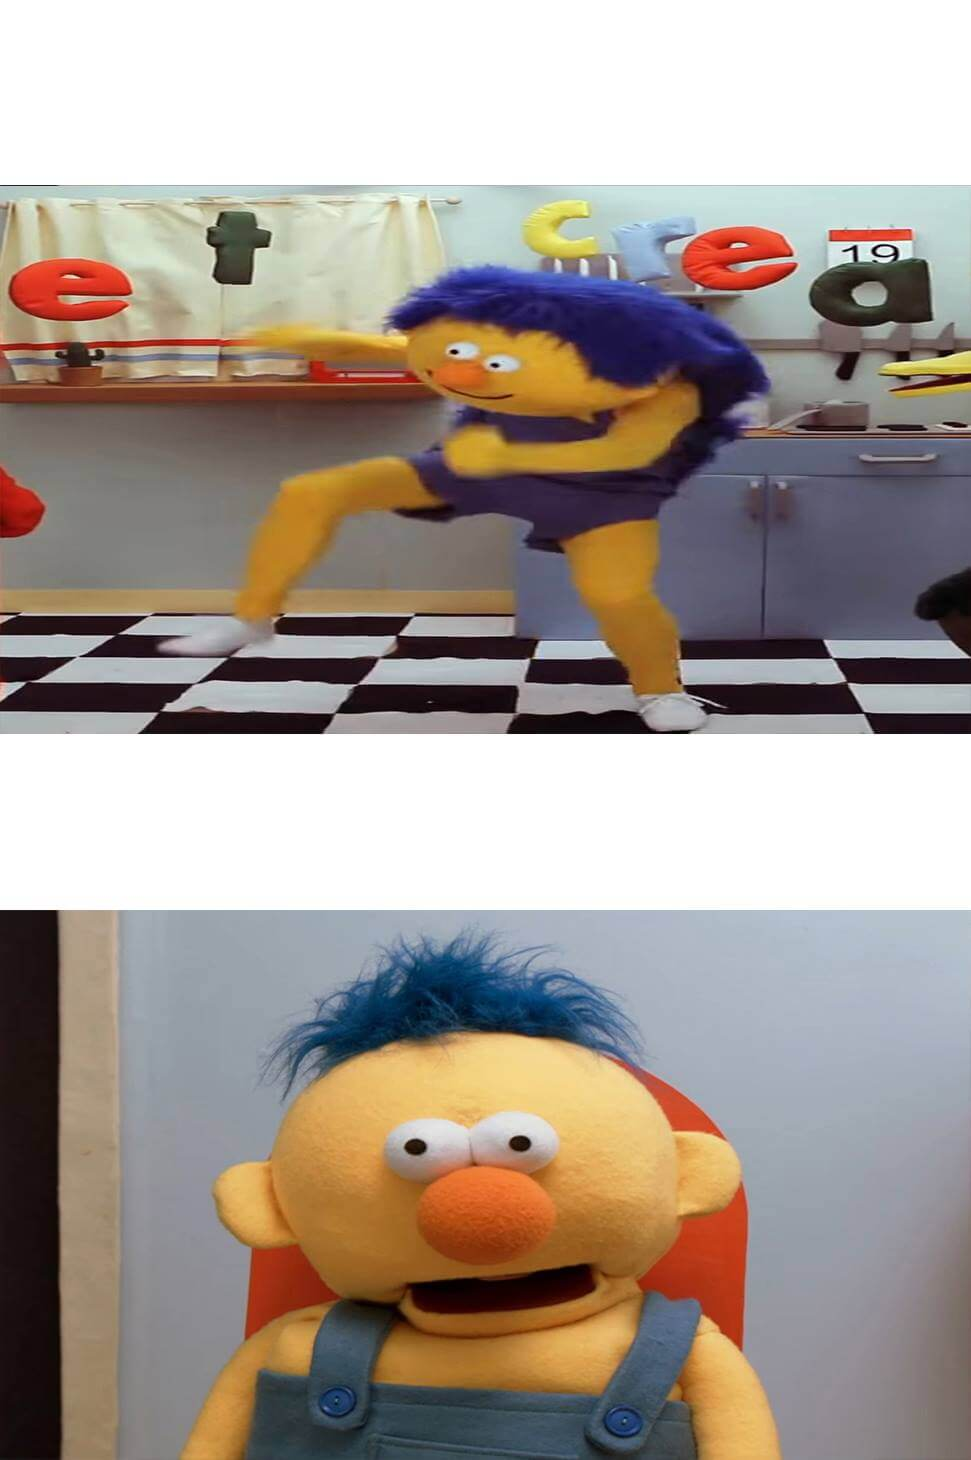 Plantilla de Yellow Guy bailando  Yellow Guy sorprendido